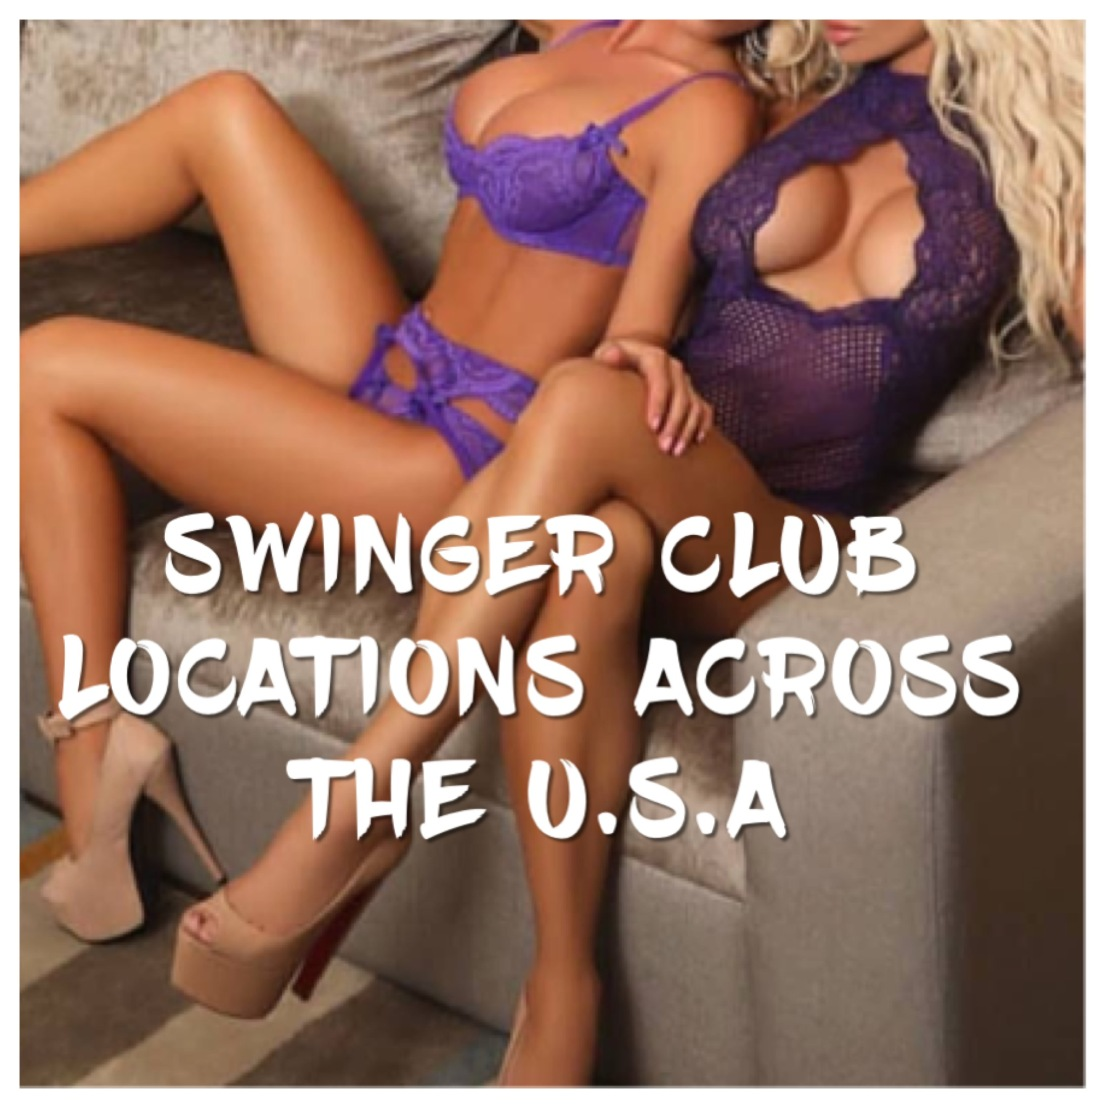 Actions big swingers party igloo south dakota asian girl